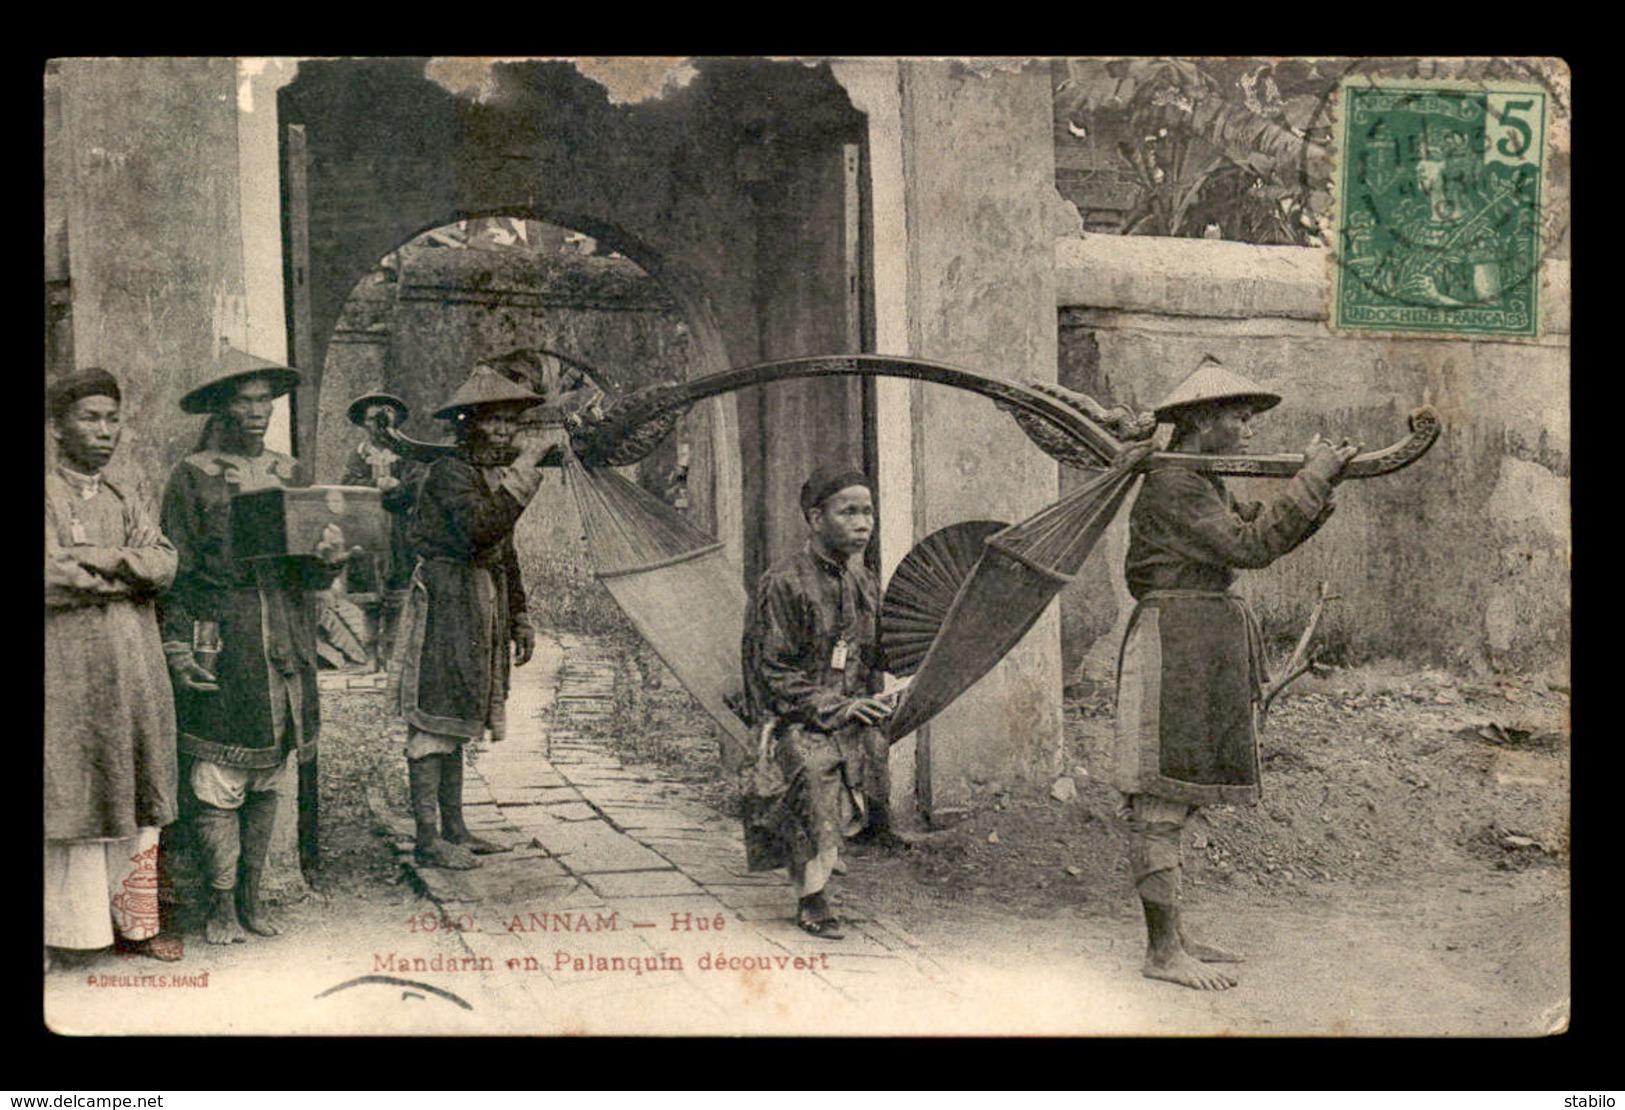 VIET-NAM - ANNAM - HUE - MANDARIN EN PALANQUIN DECOUVERT - EDITEUR DIEULEFILS - Vietnam